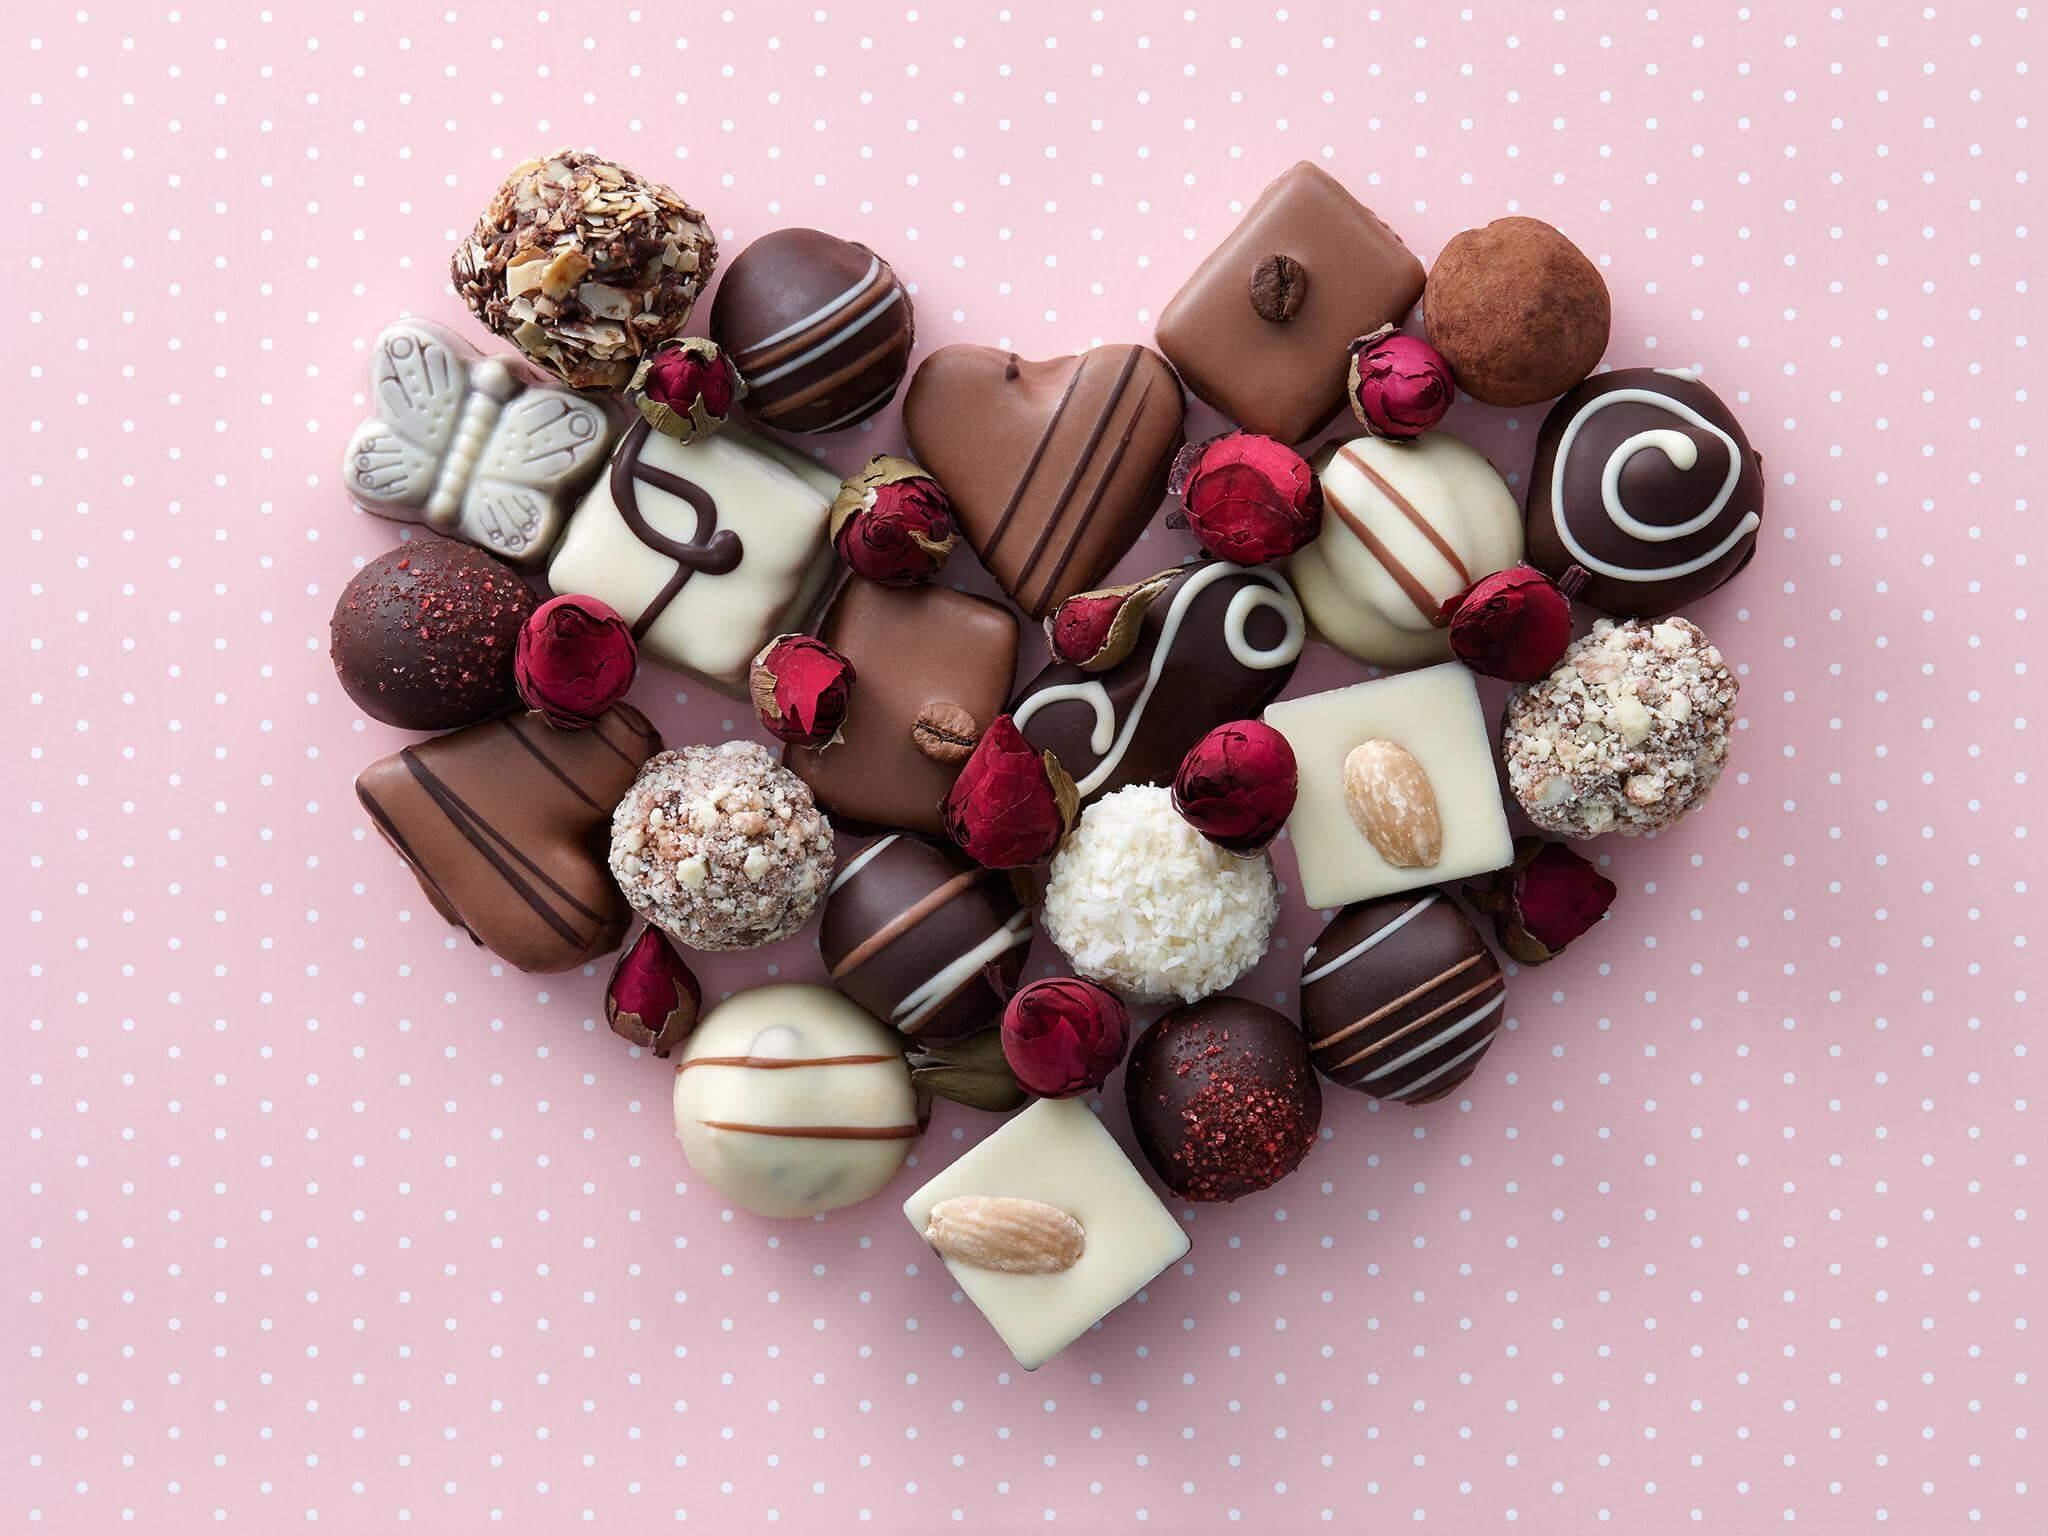 socola-chocotale-valentine